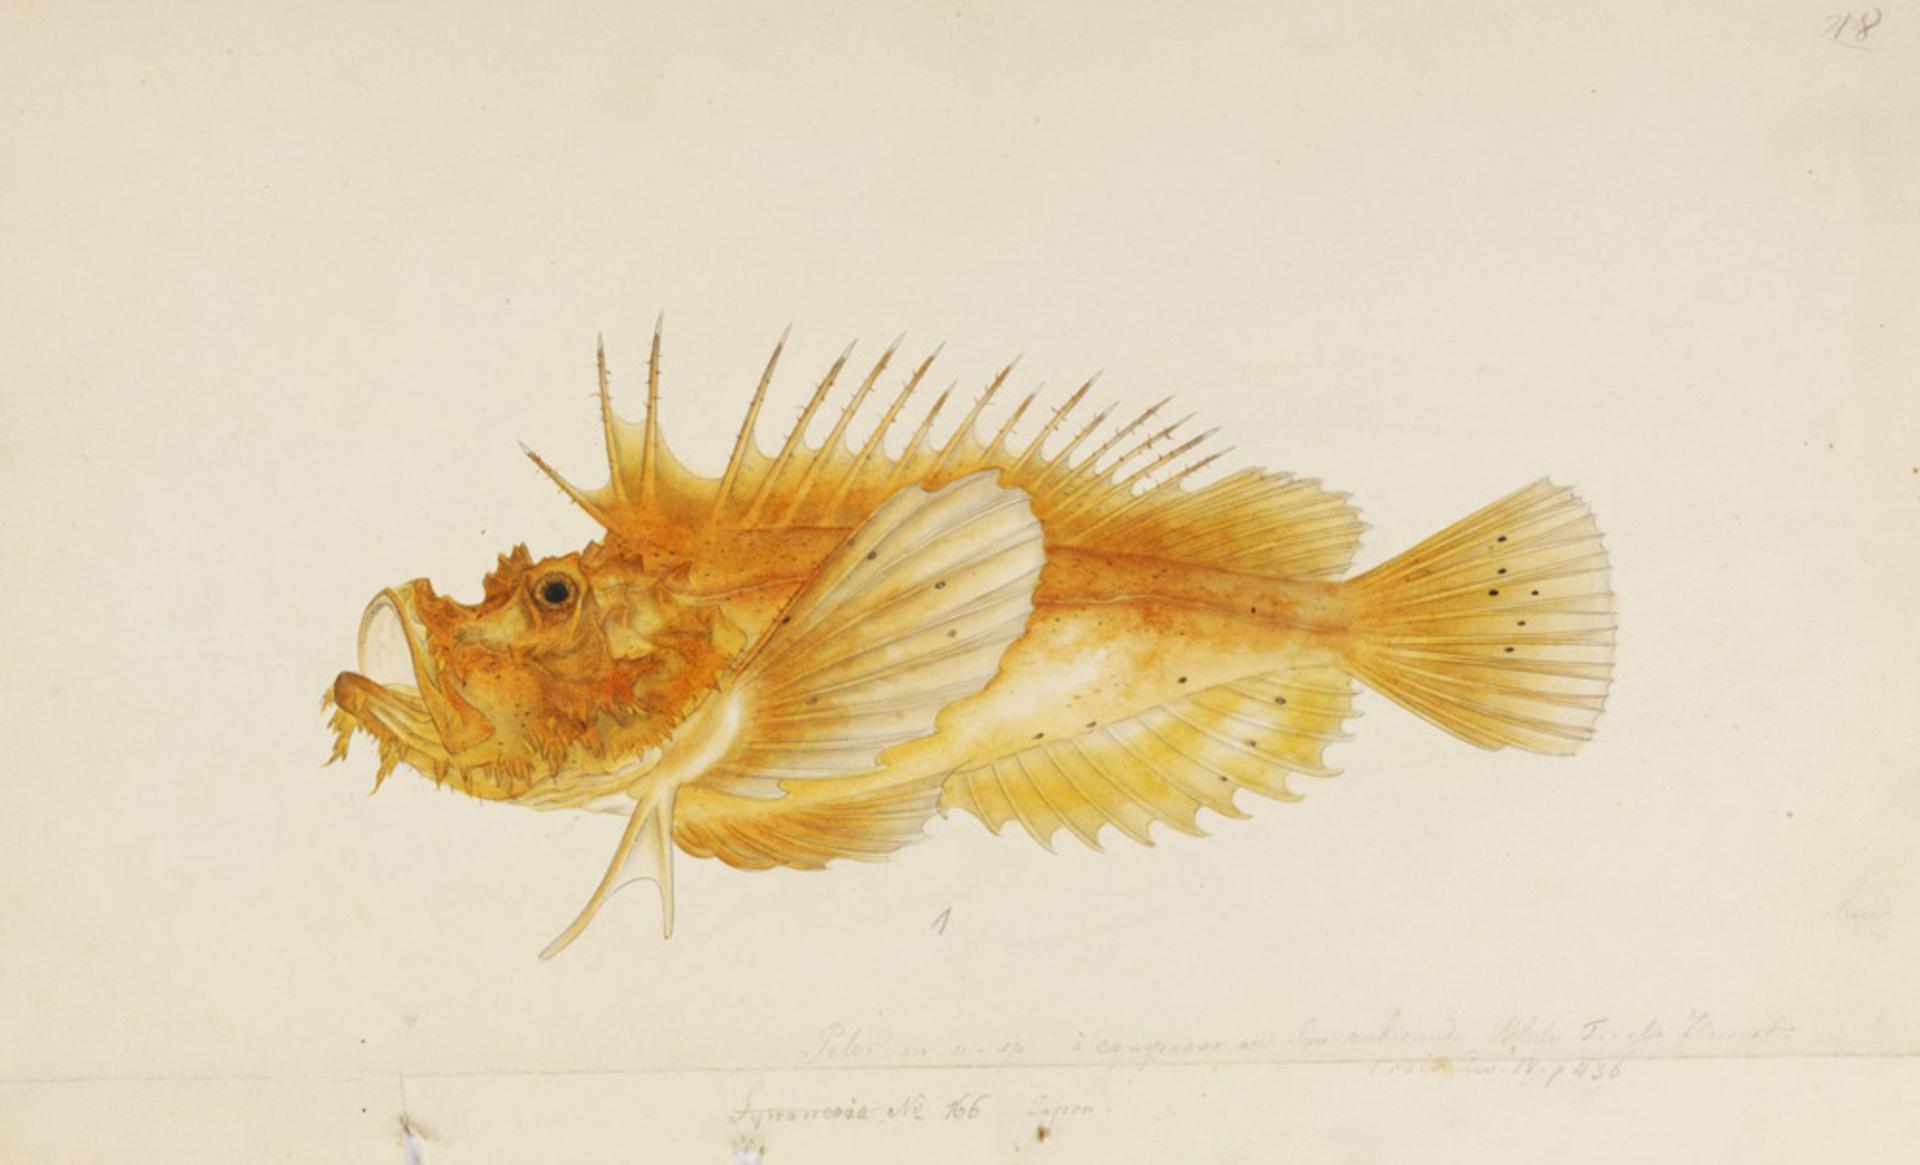 RMNH.ART.261 | Inimicus japonicus